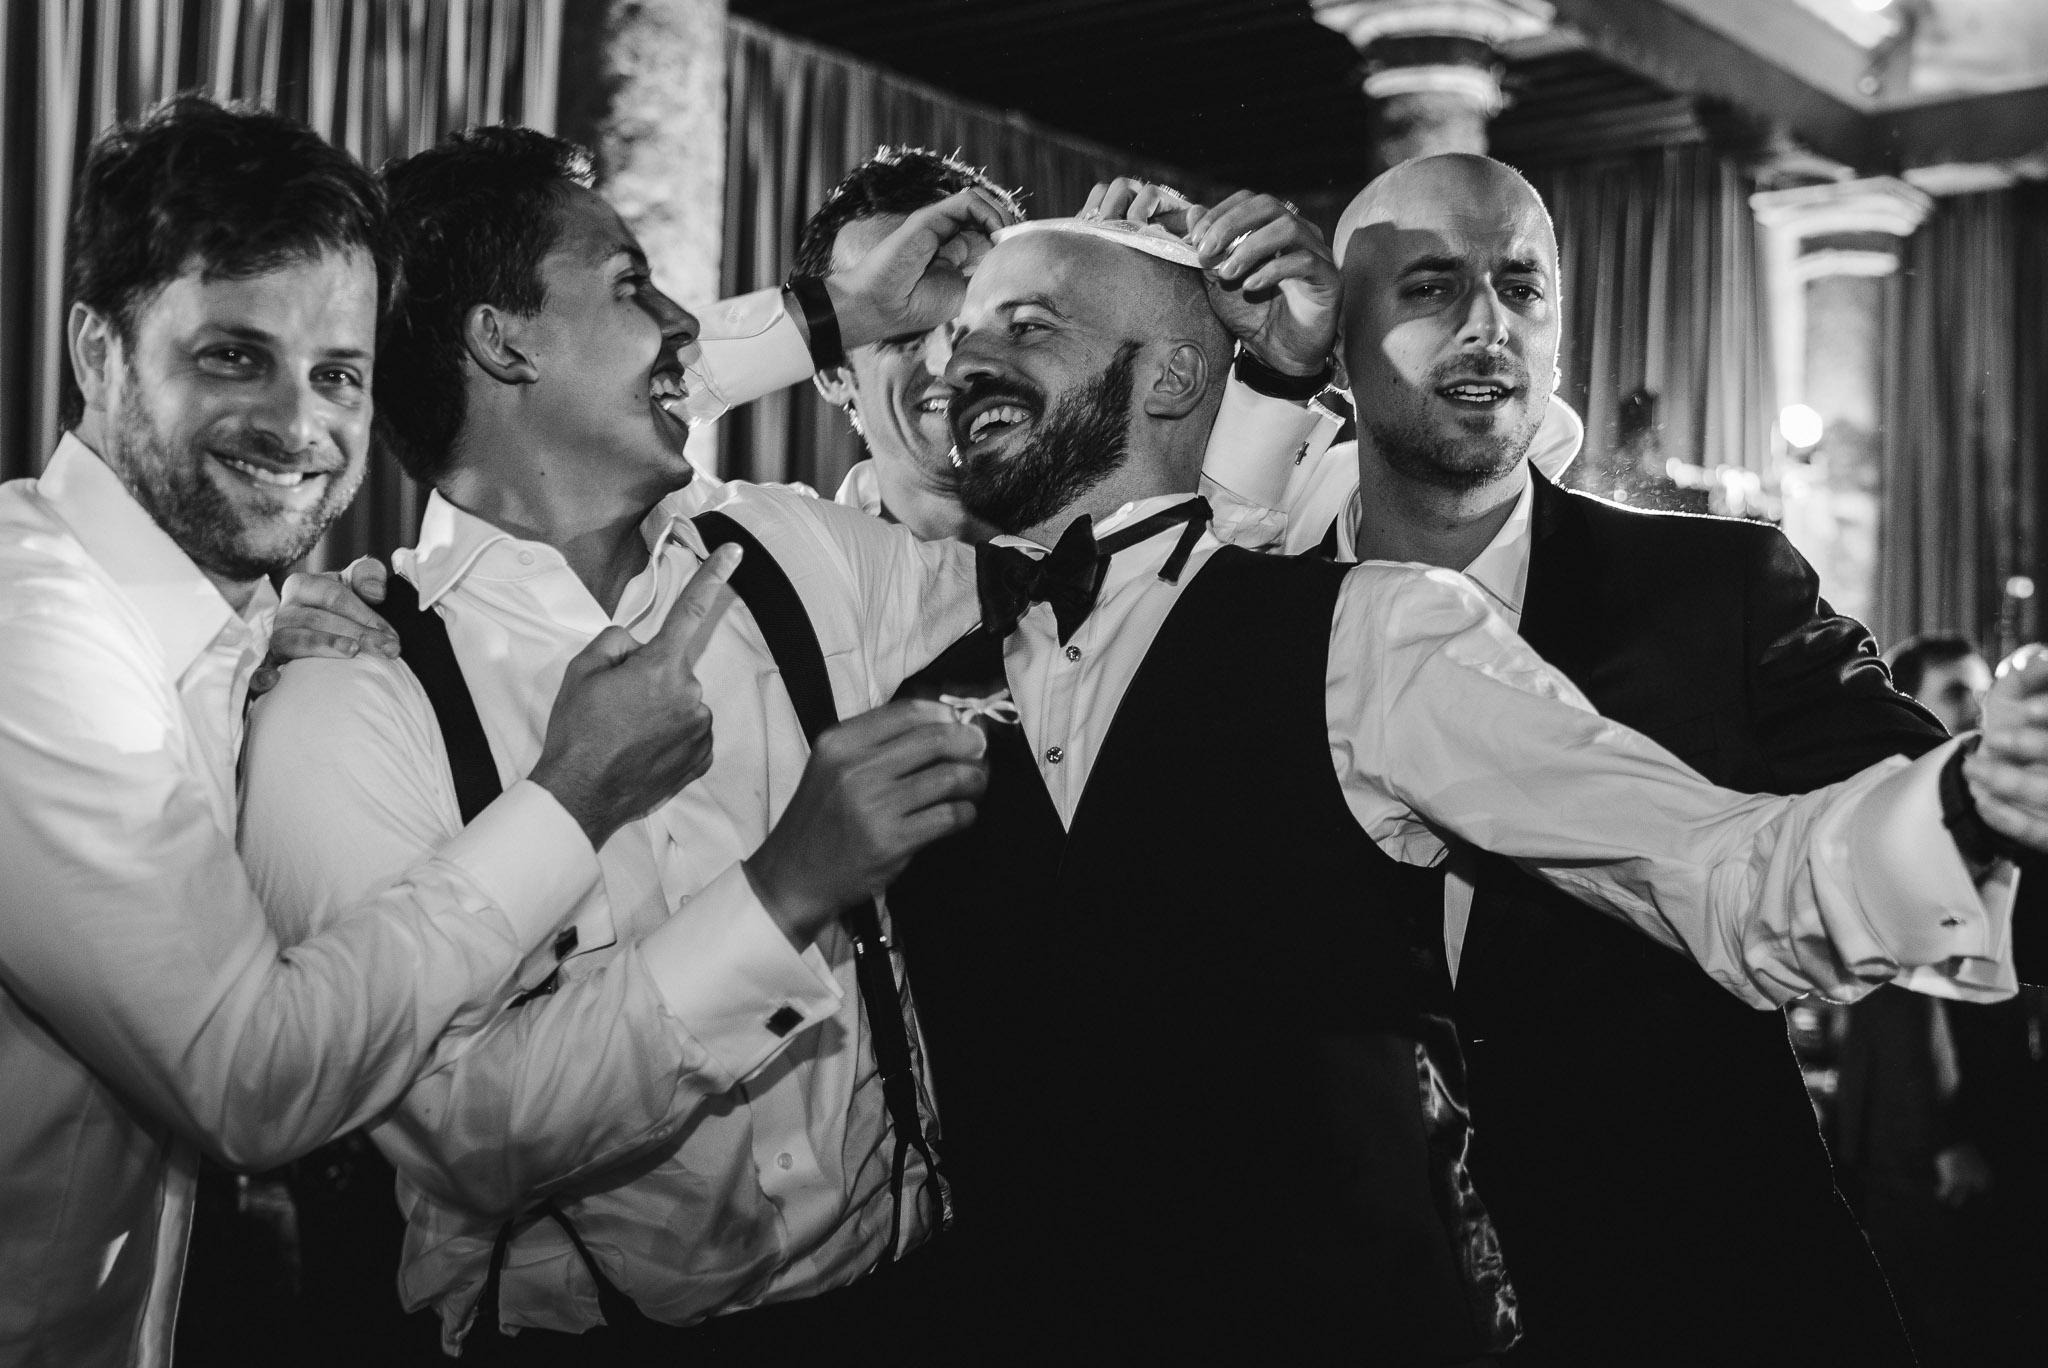 ©www.mauriziosolisbroca.com-20161002maurizio-solis-broca-mexico-canada-wedding-photographer20161002DSC00514-Edit.jpg